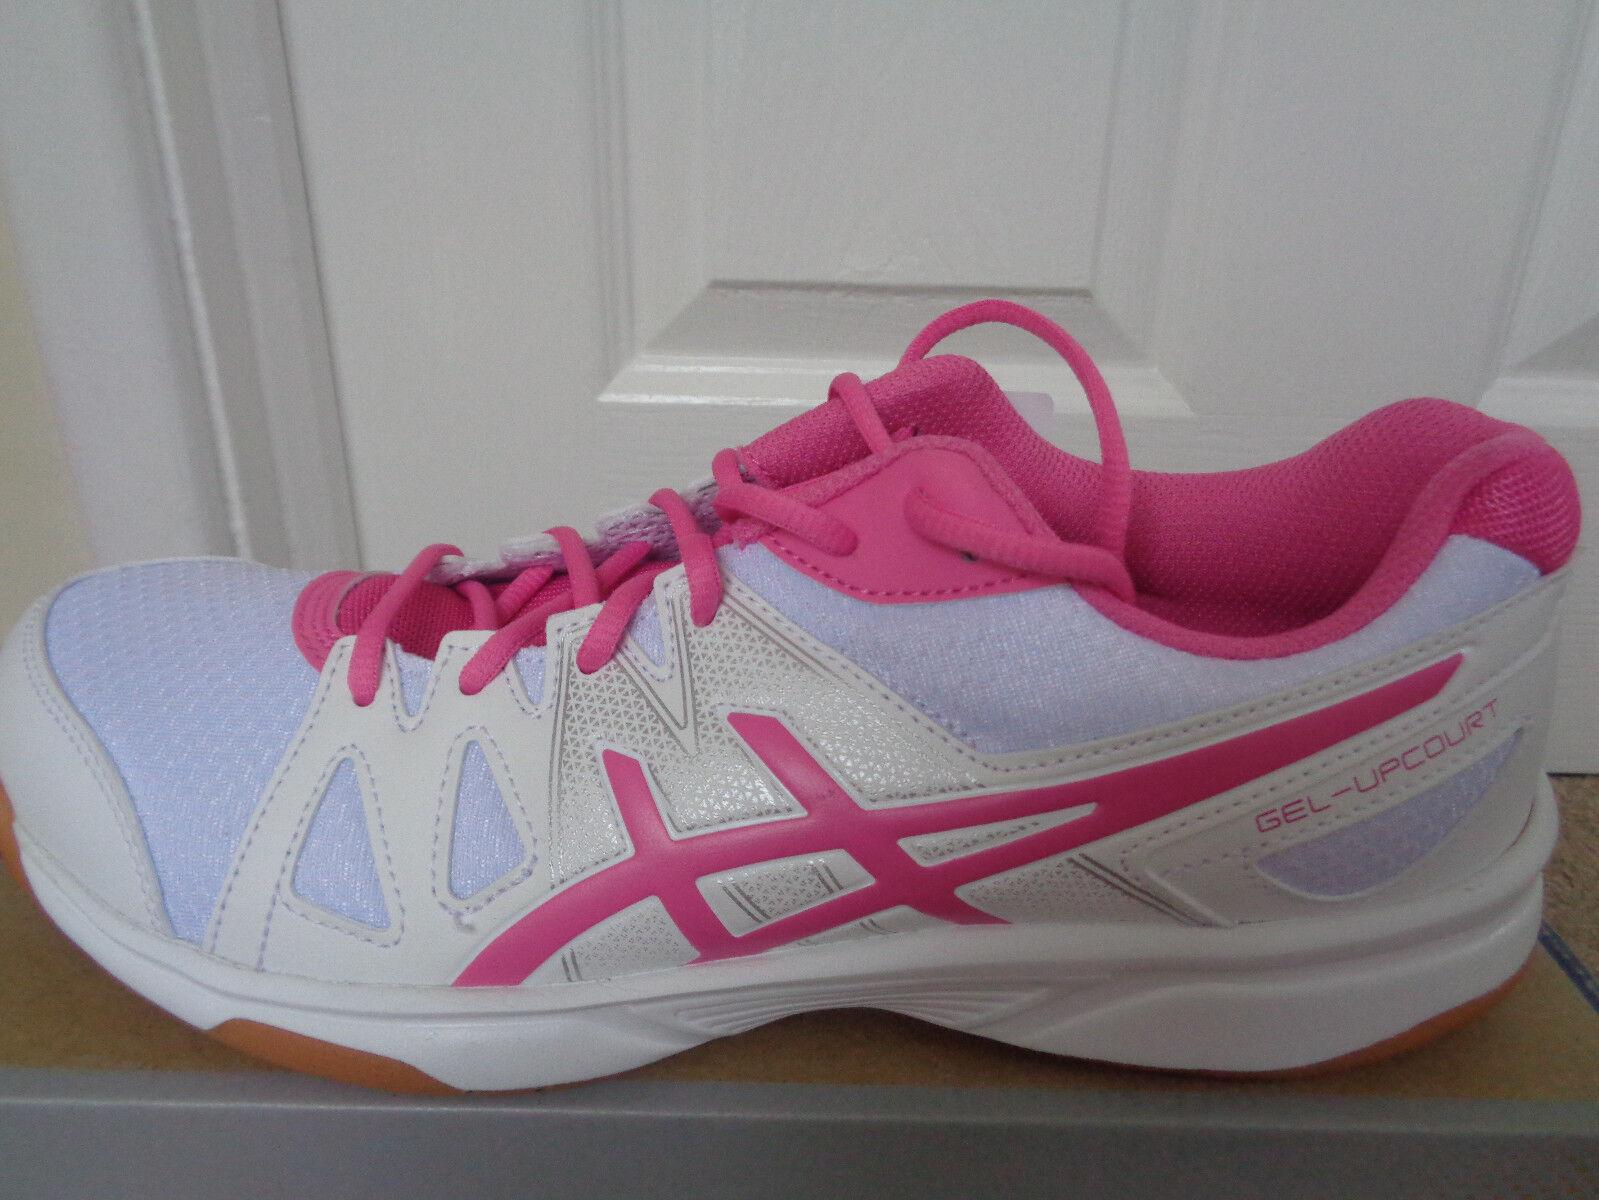 Asics Gel-Upcourt femmes trainers chaussures B450N 0120 uk 7.5 eu 41.5 us 9.5 NEW+BOX